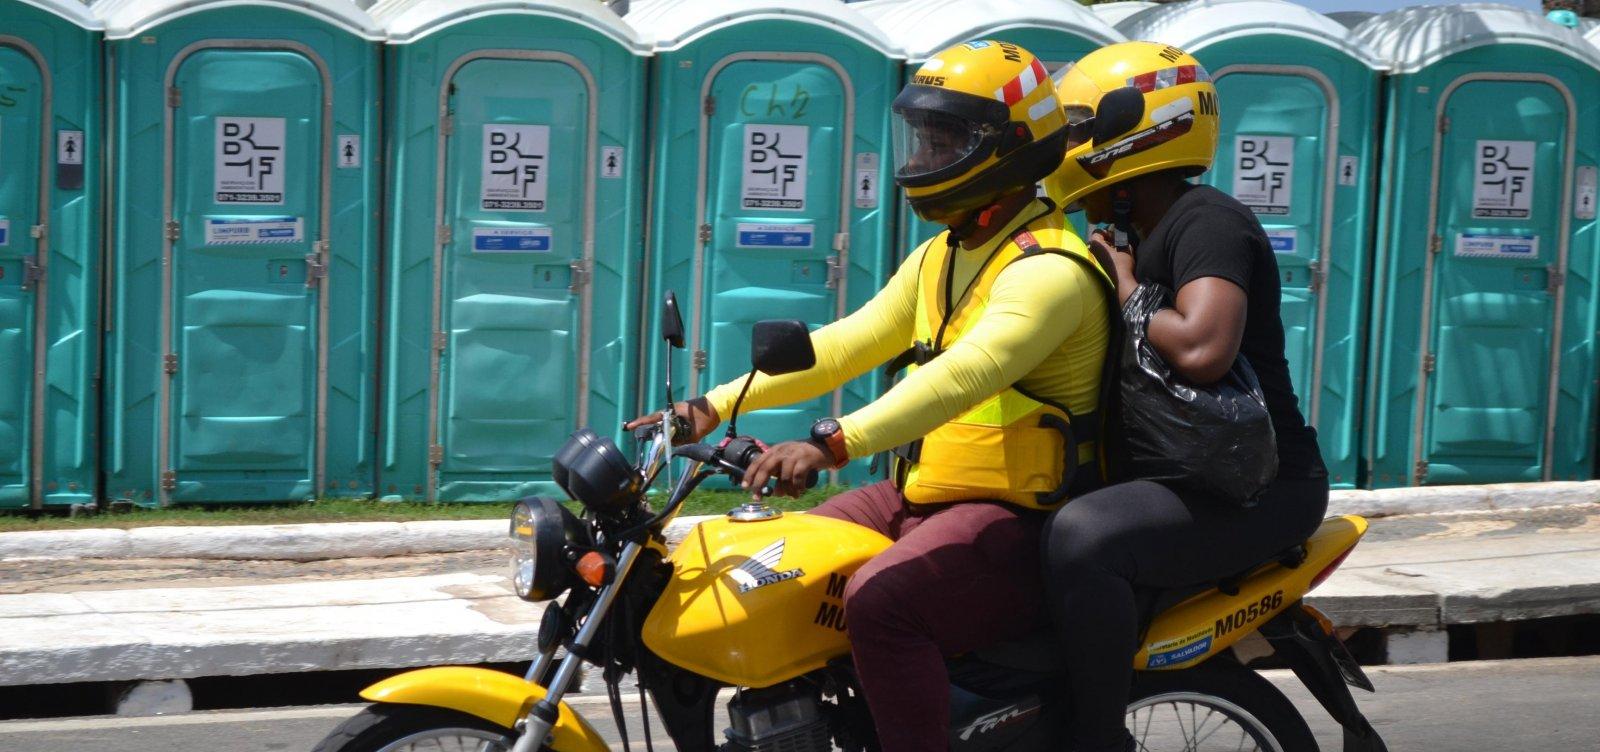 Prefeitura de Salvador retoma credenciamento para mototaxistas